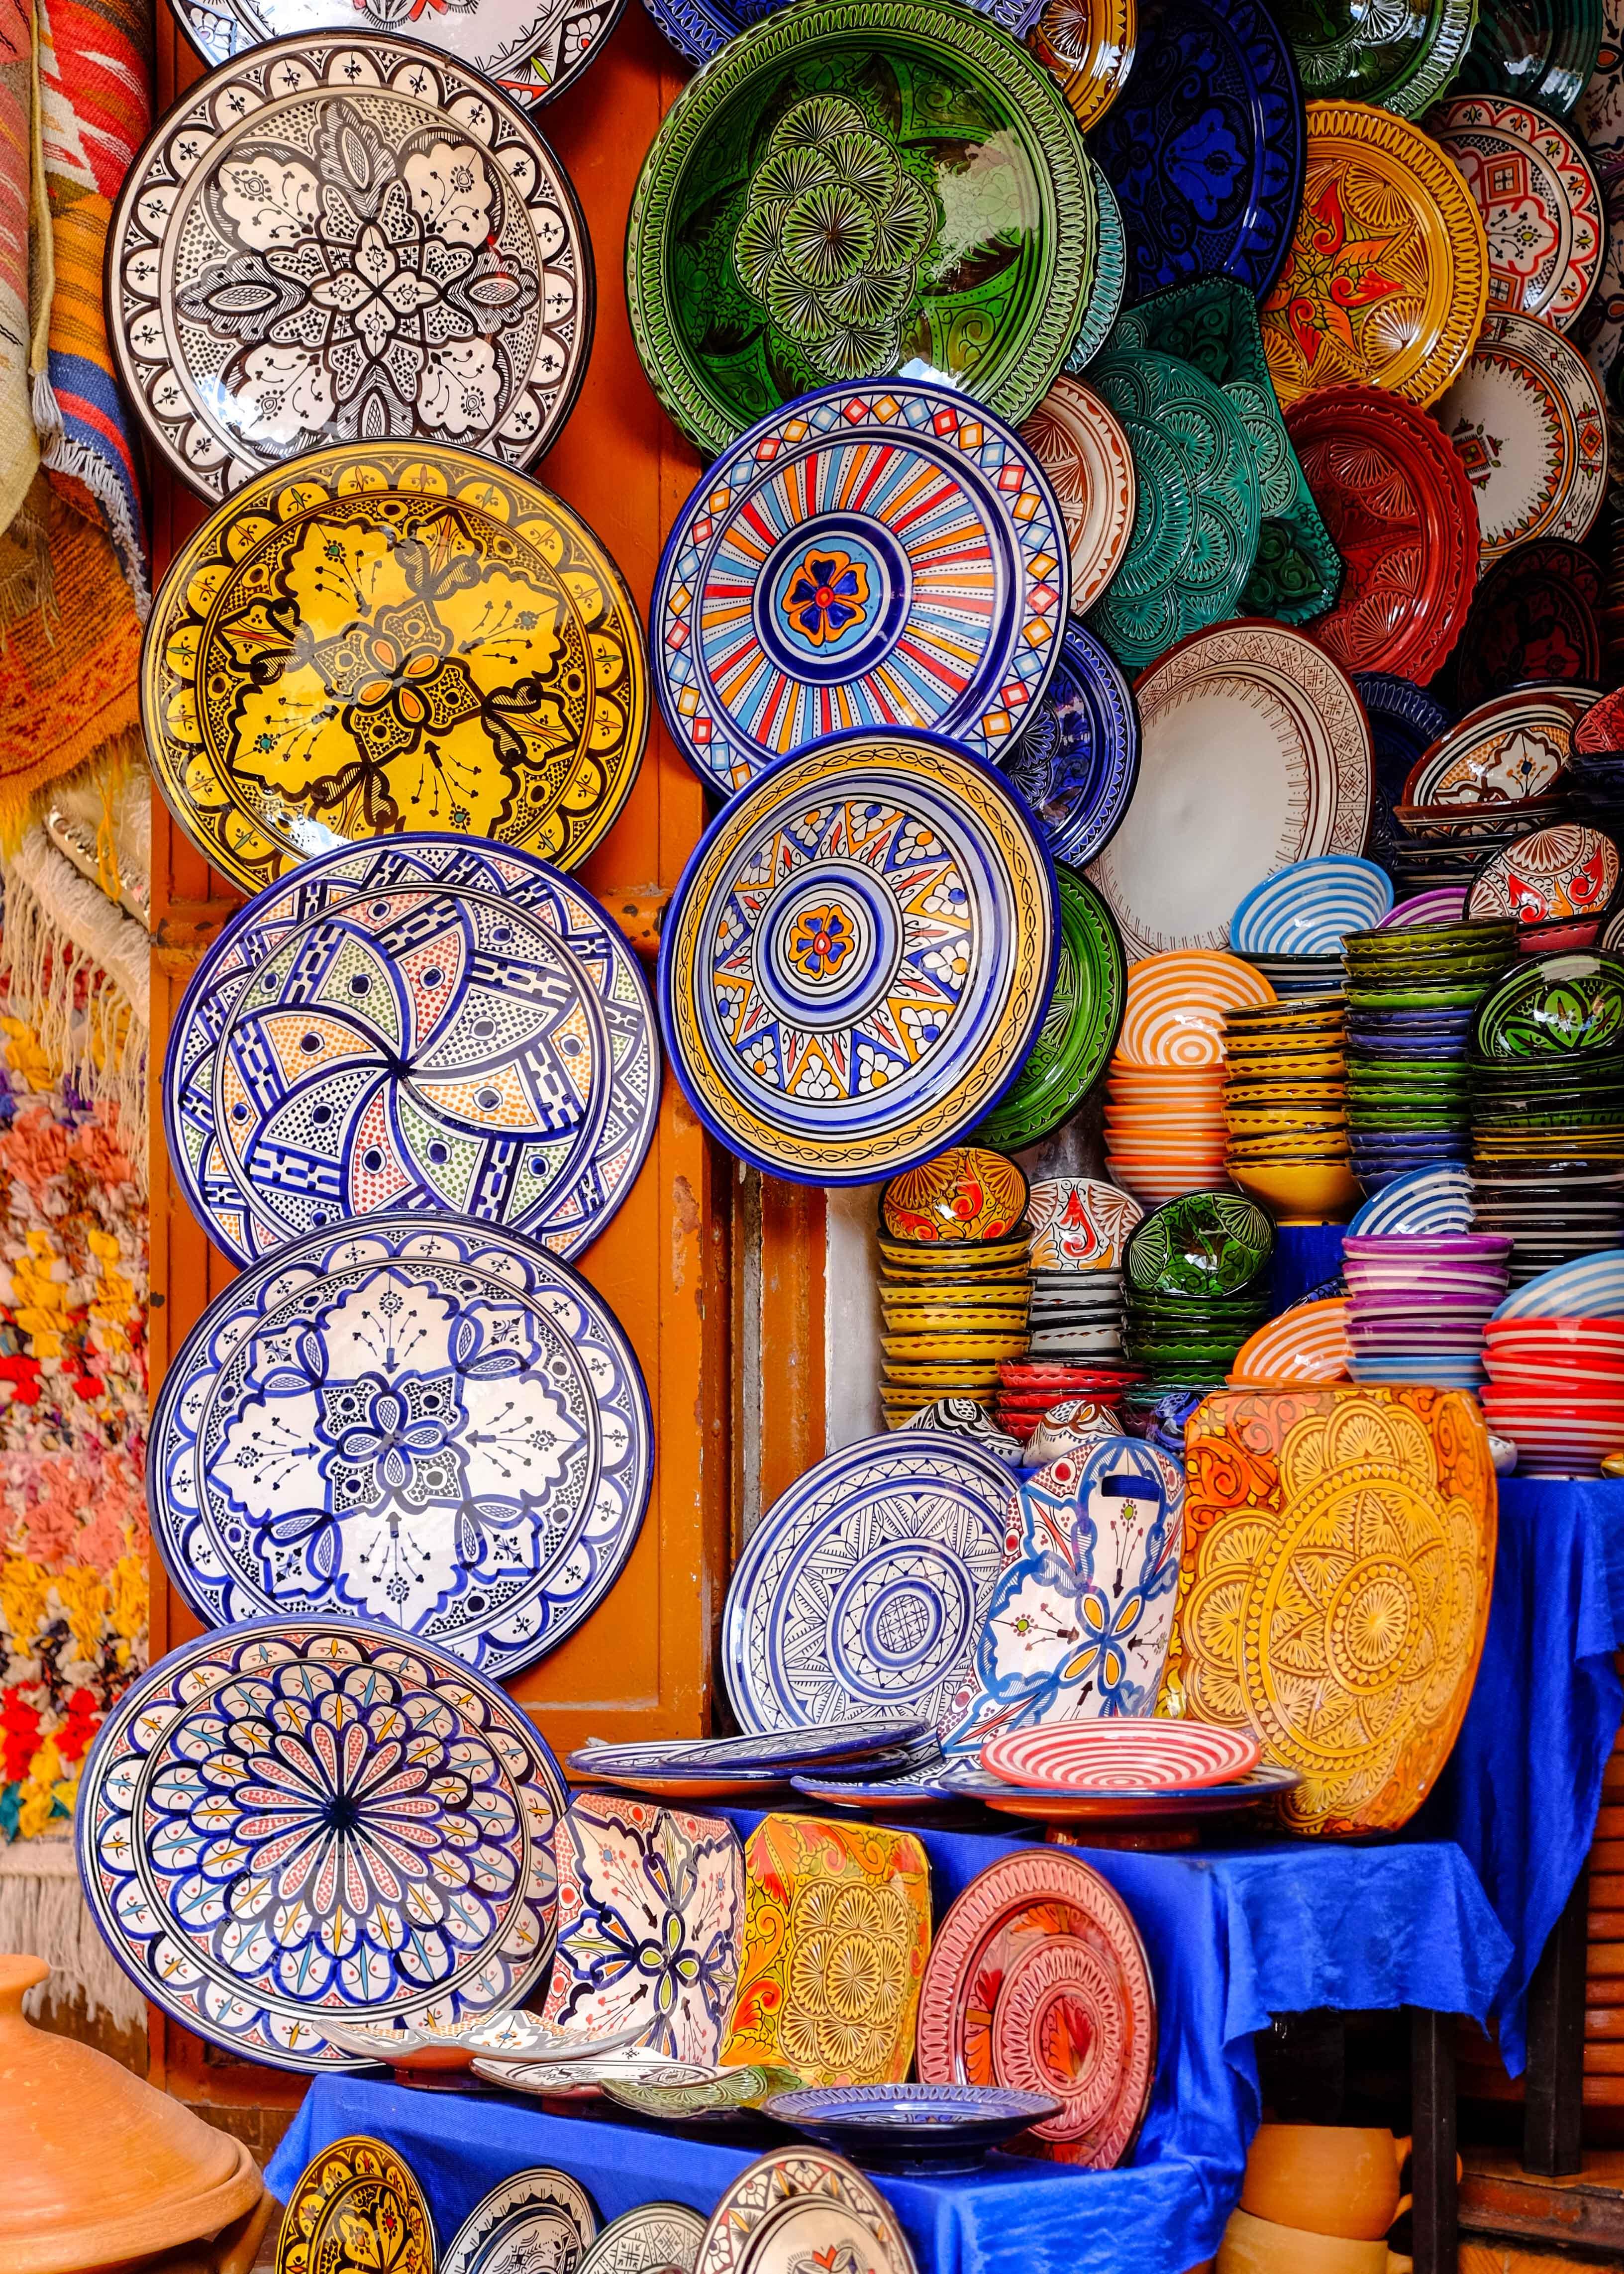 Maroc (14 of 20)